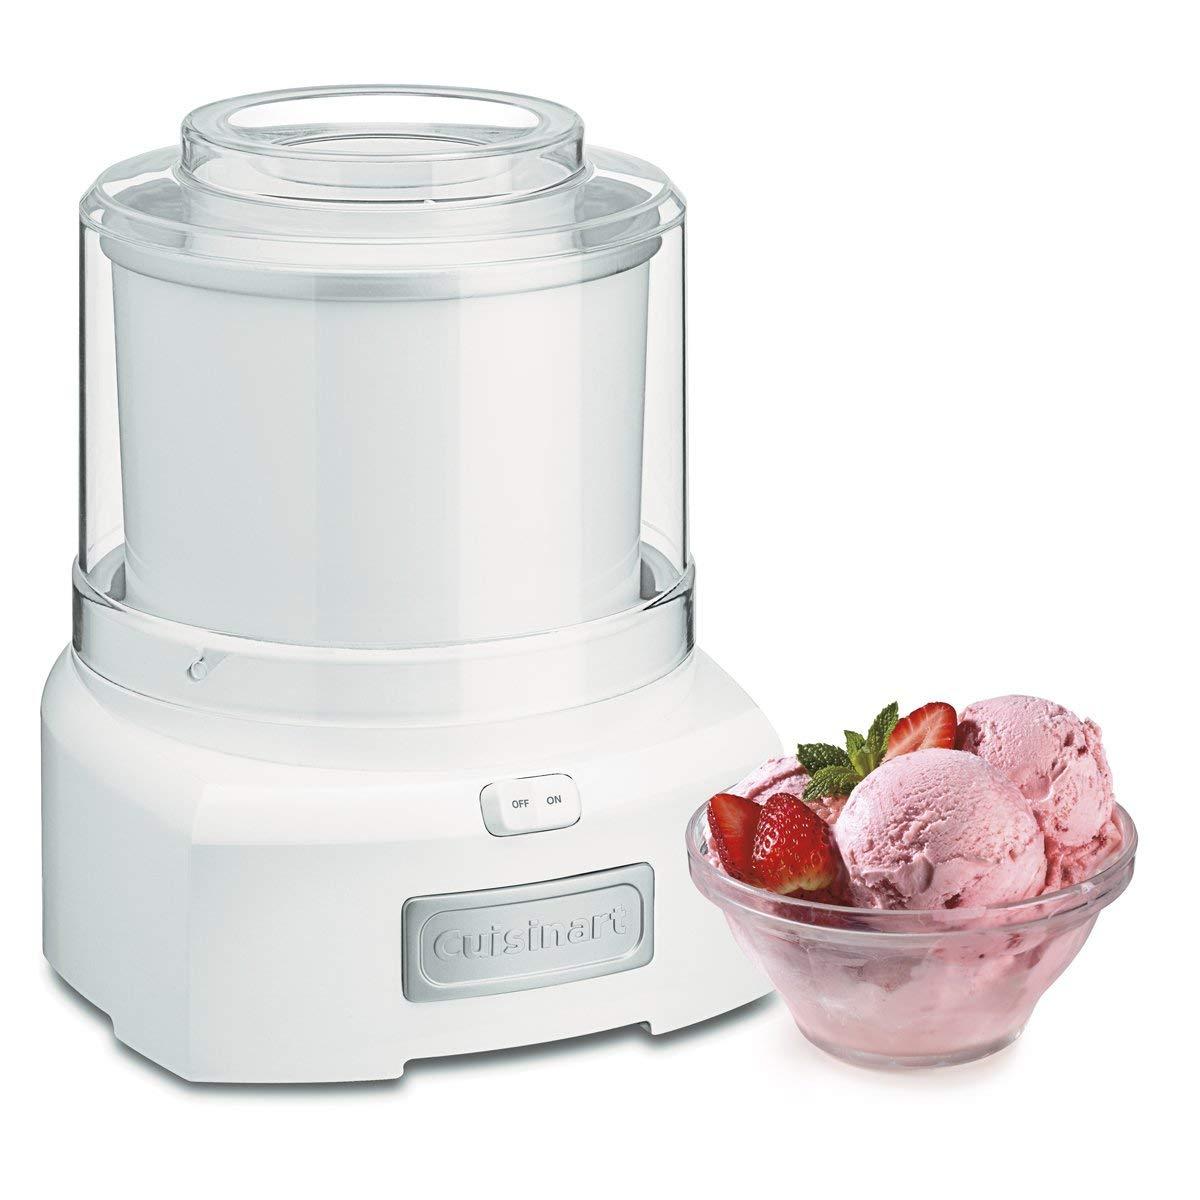 Review of Cuisinart ICE-21 1.5 Quart Frozen Yogurt-Ice Cream Maker